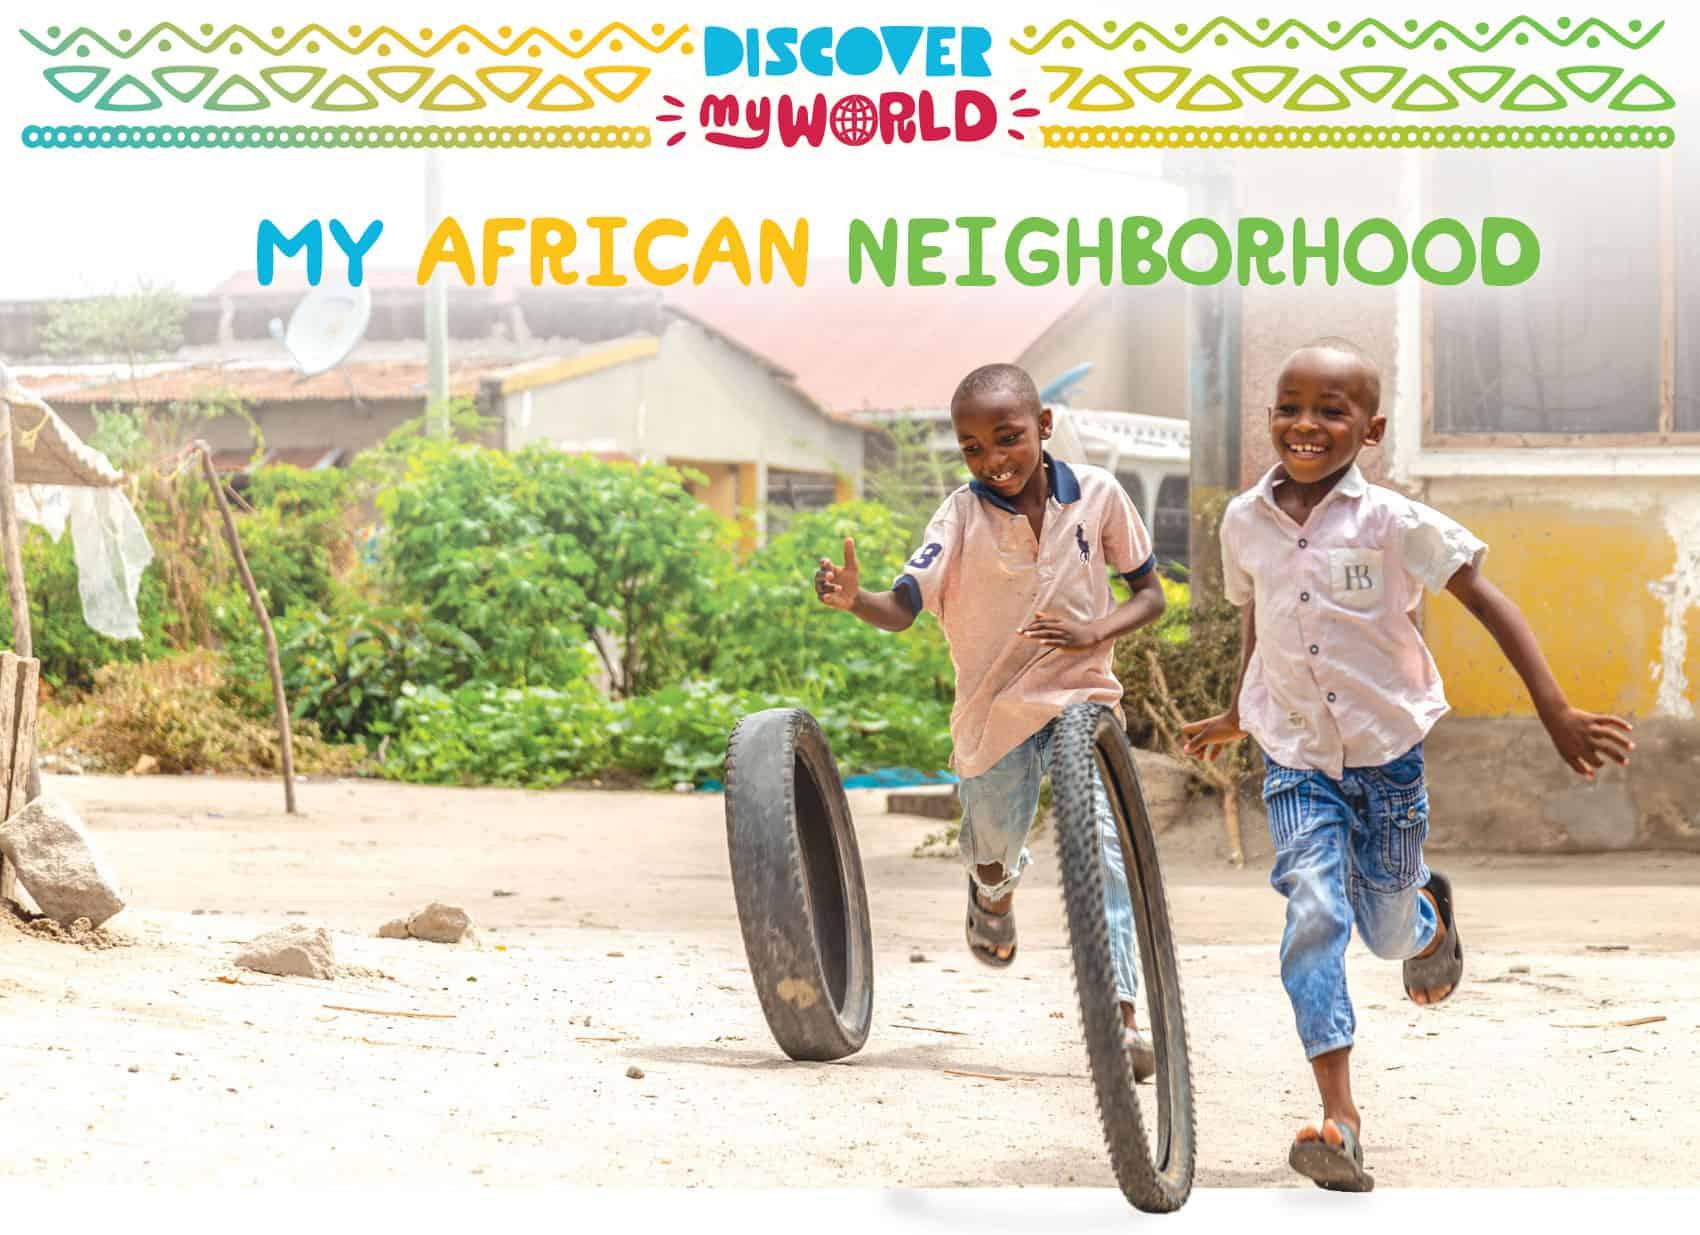 DiscoverMyAfricanNeighborhood-banner